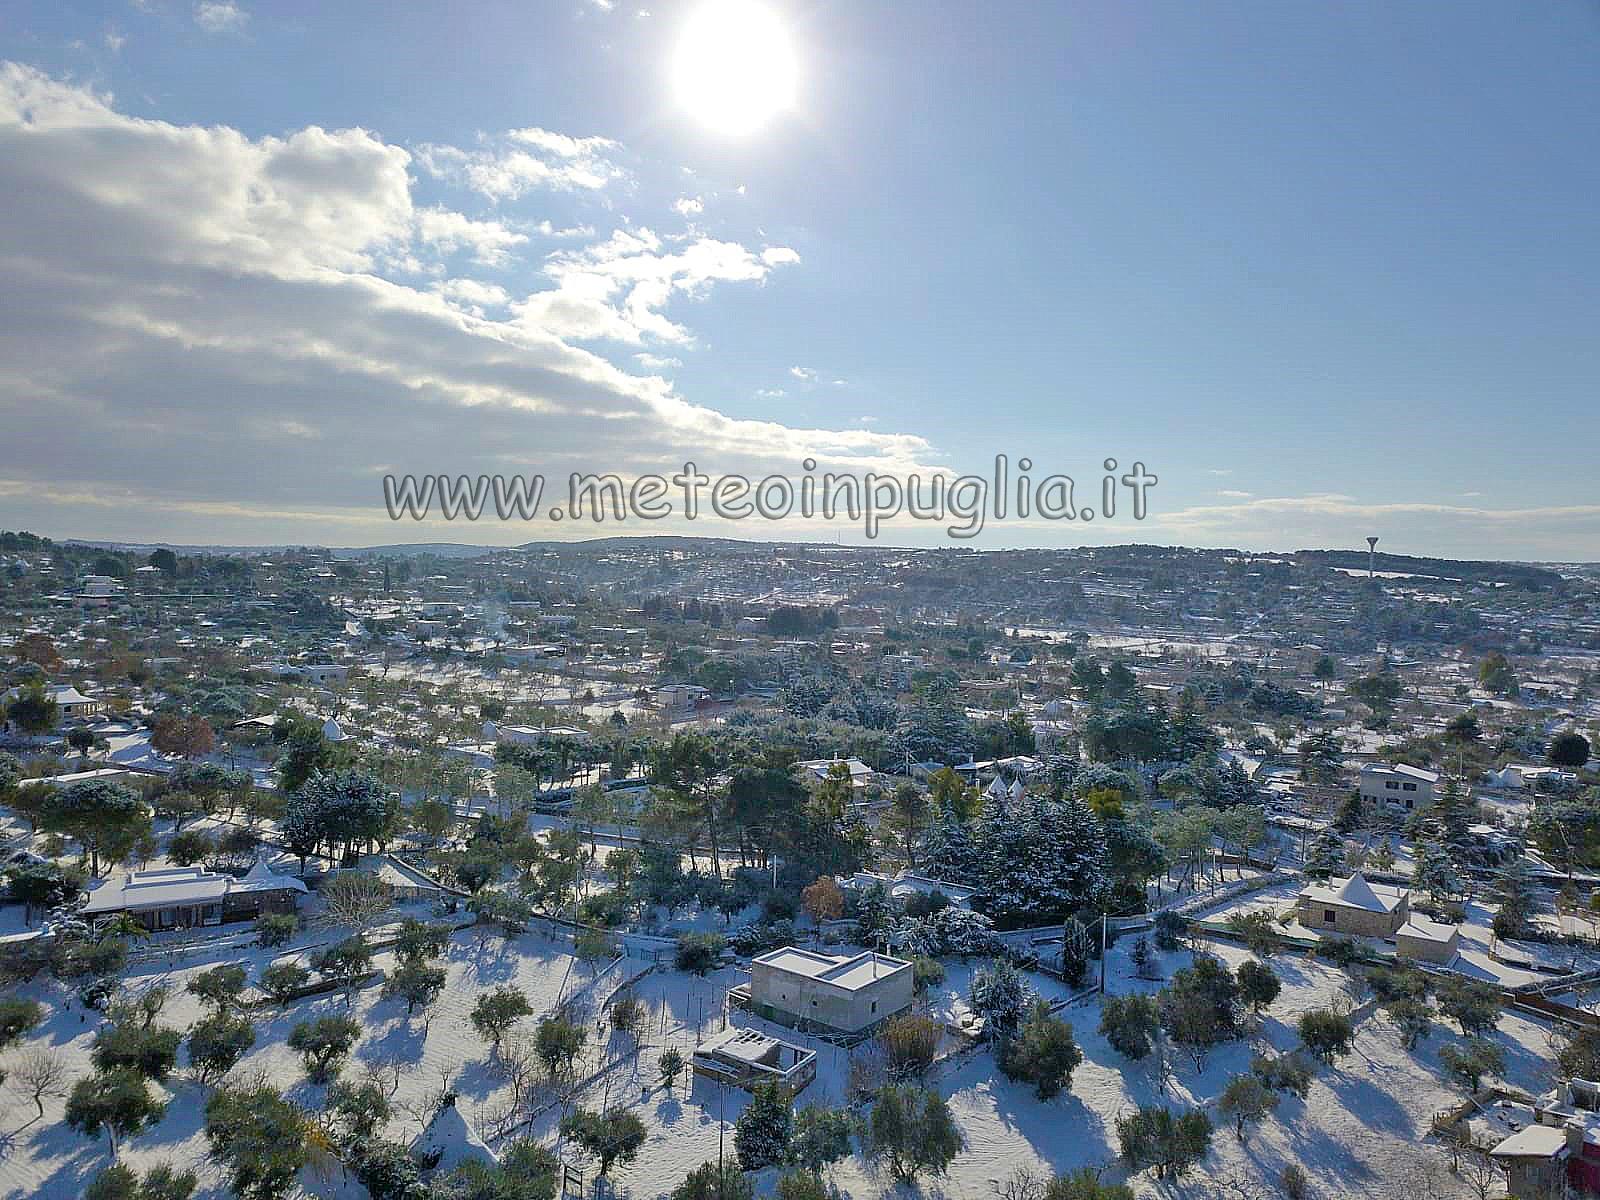 Galleria fotografica neve 03-04 gennaio 2019-putignano-05-01-2019.jpg